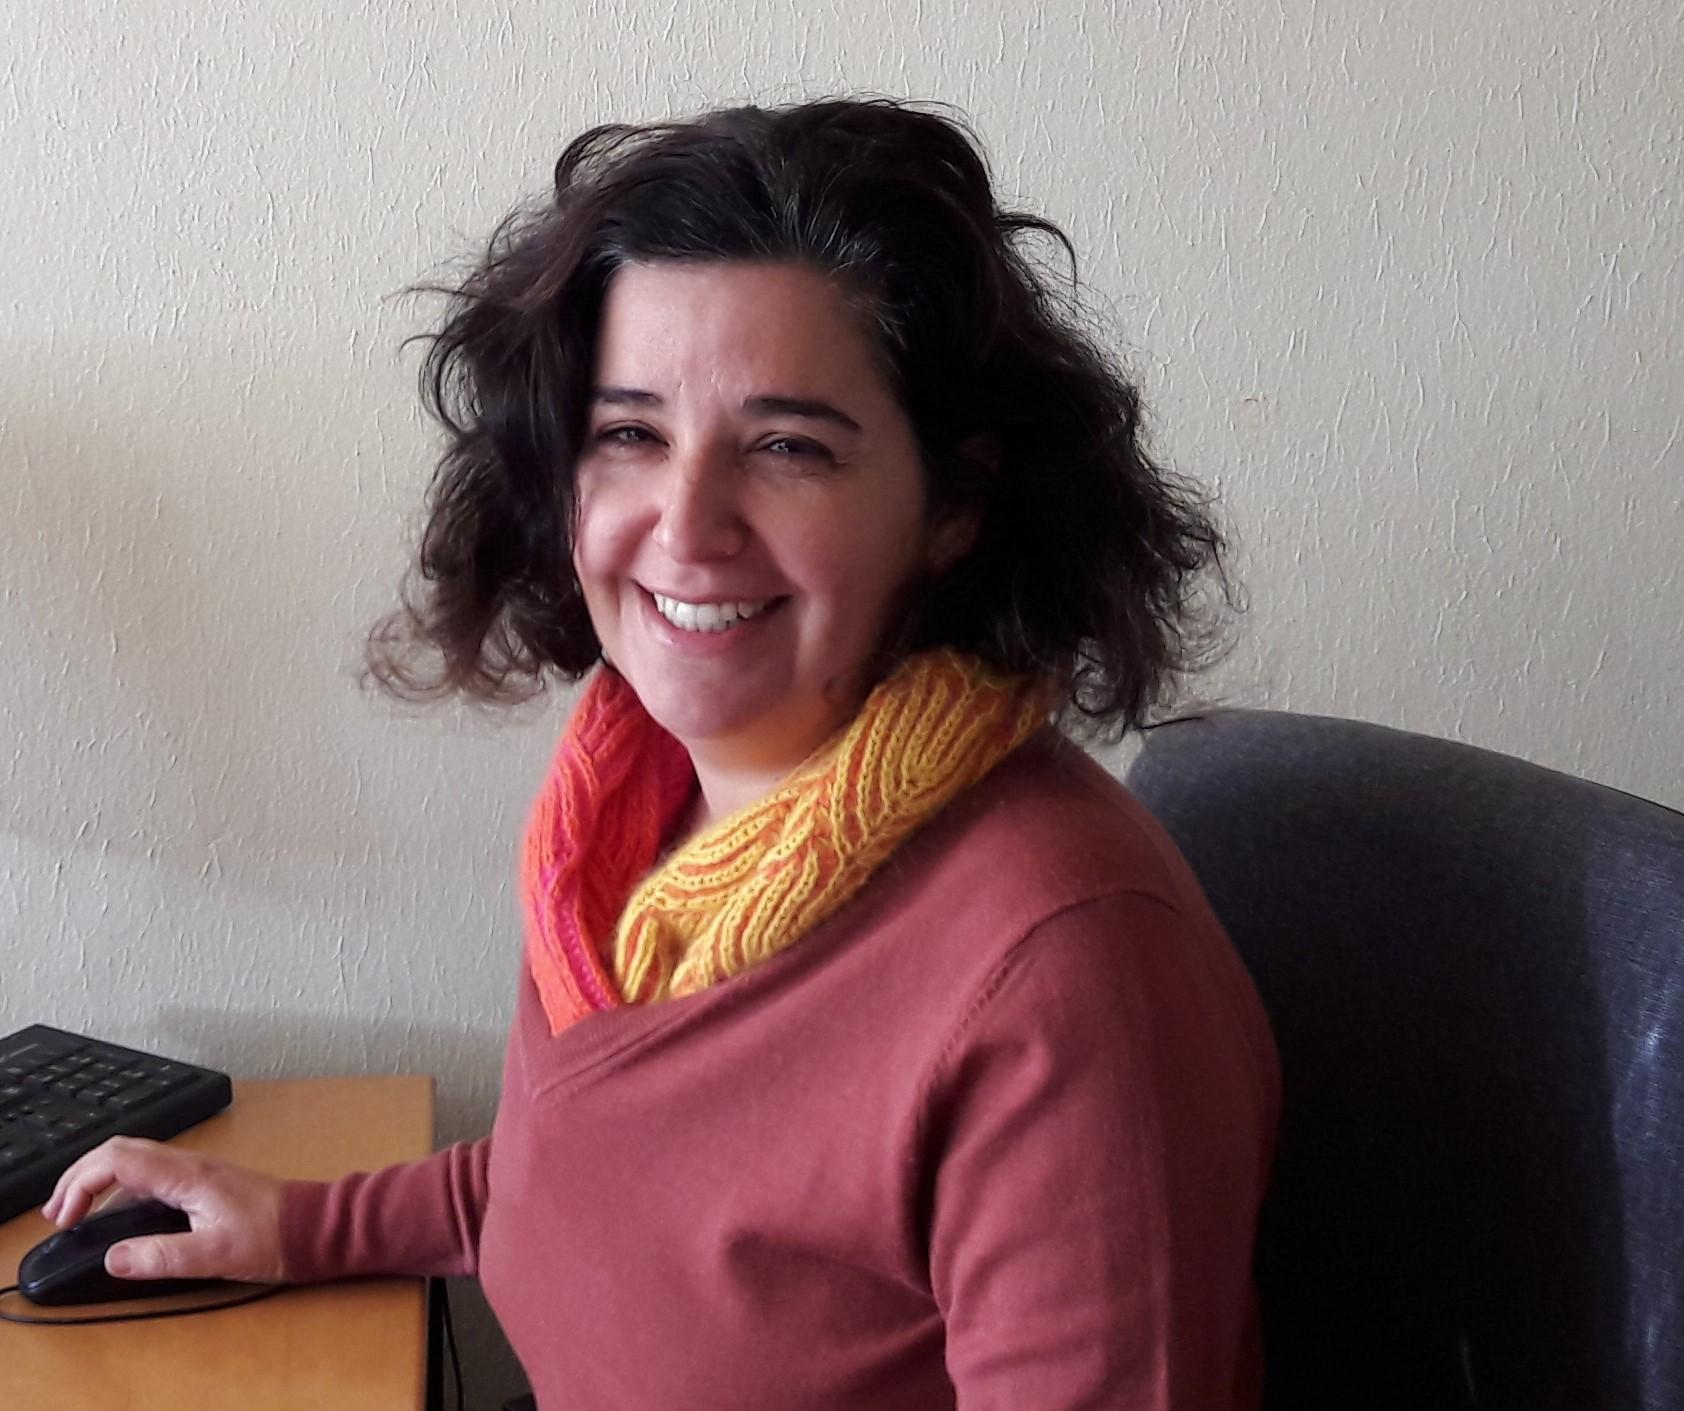 Cláudia Nunes Philippart